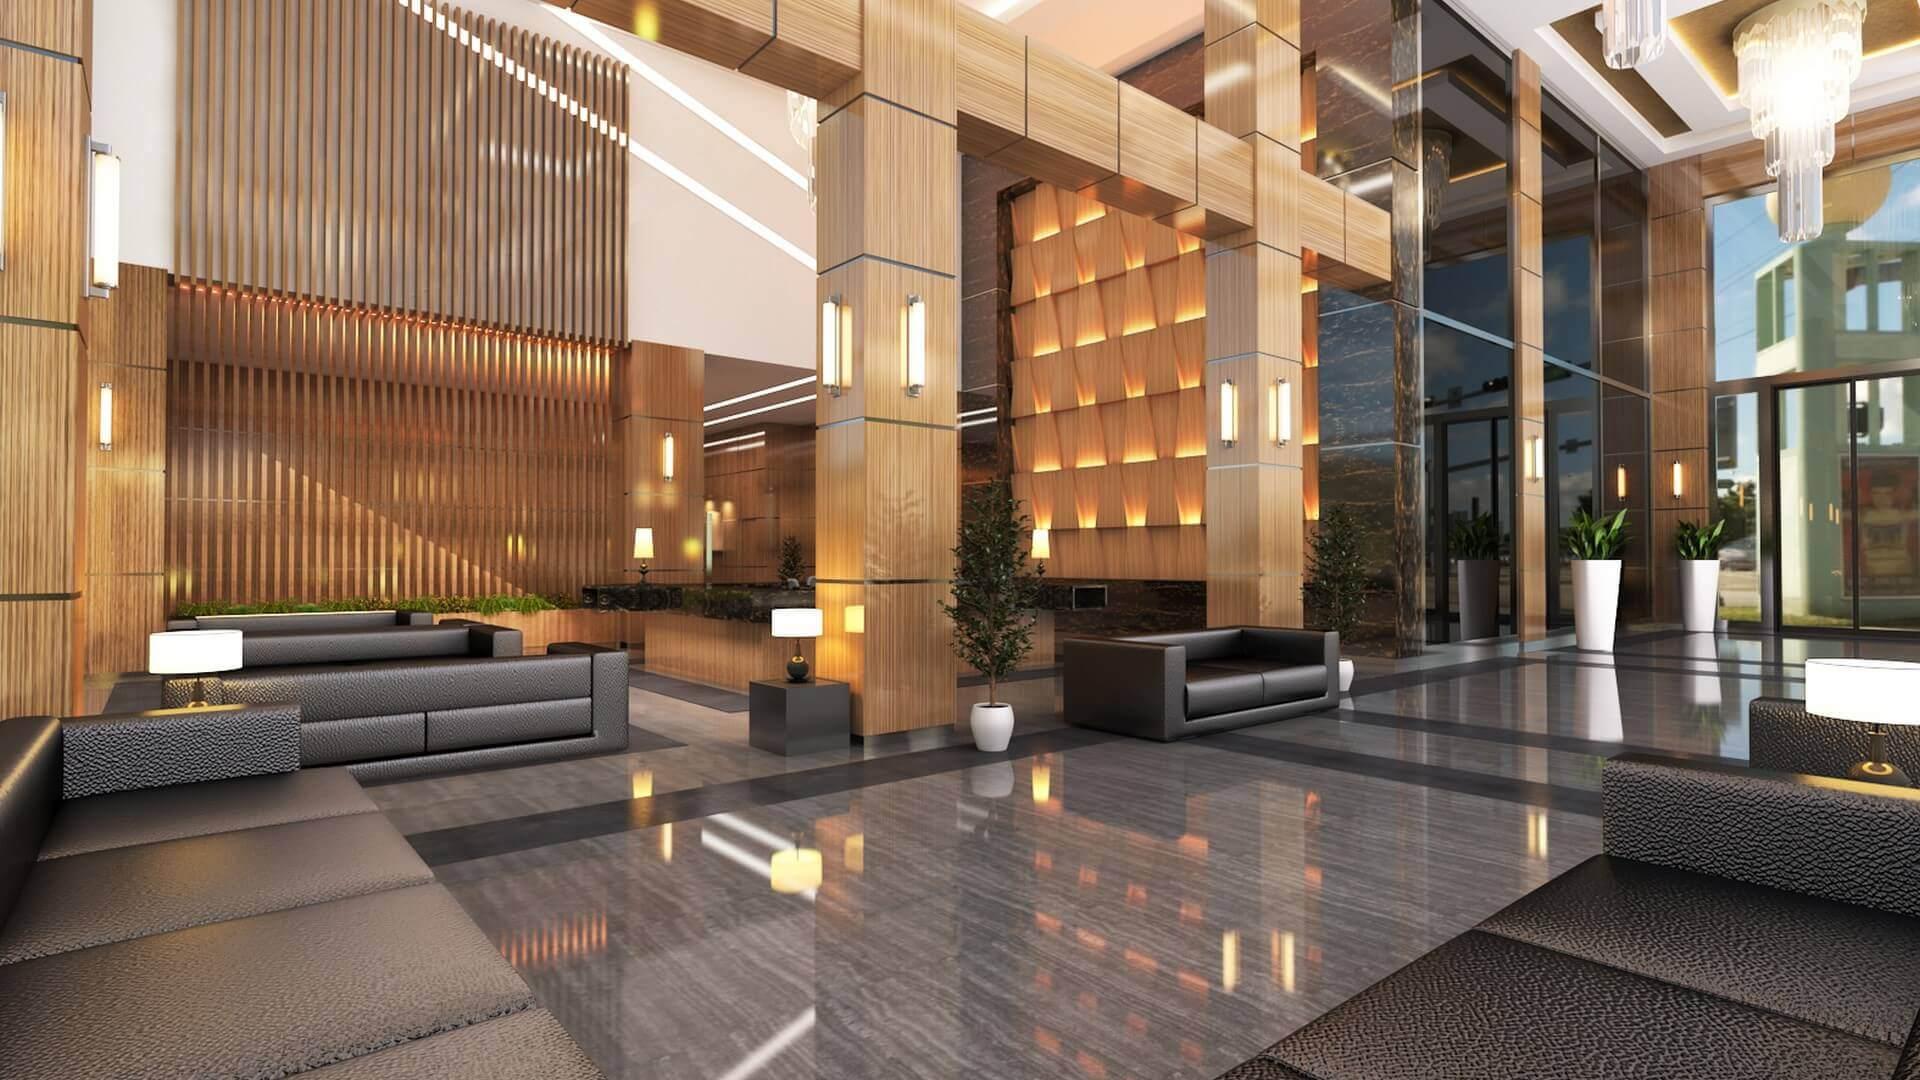 Yelken Plaza 2707 Yelken Business Tower Entrance Offices